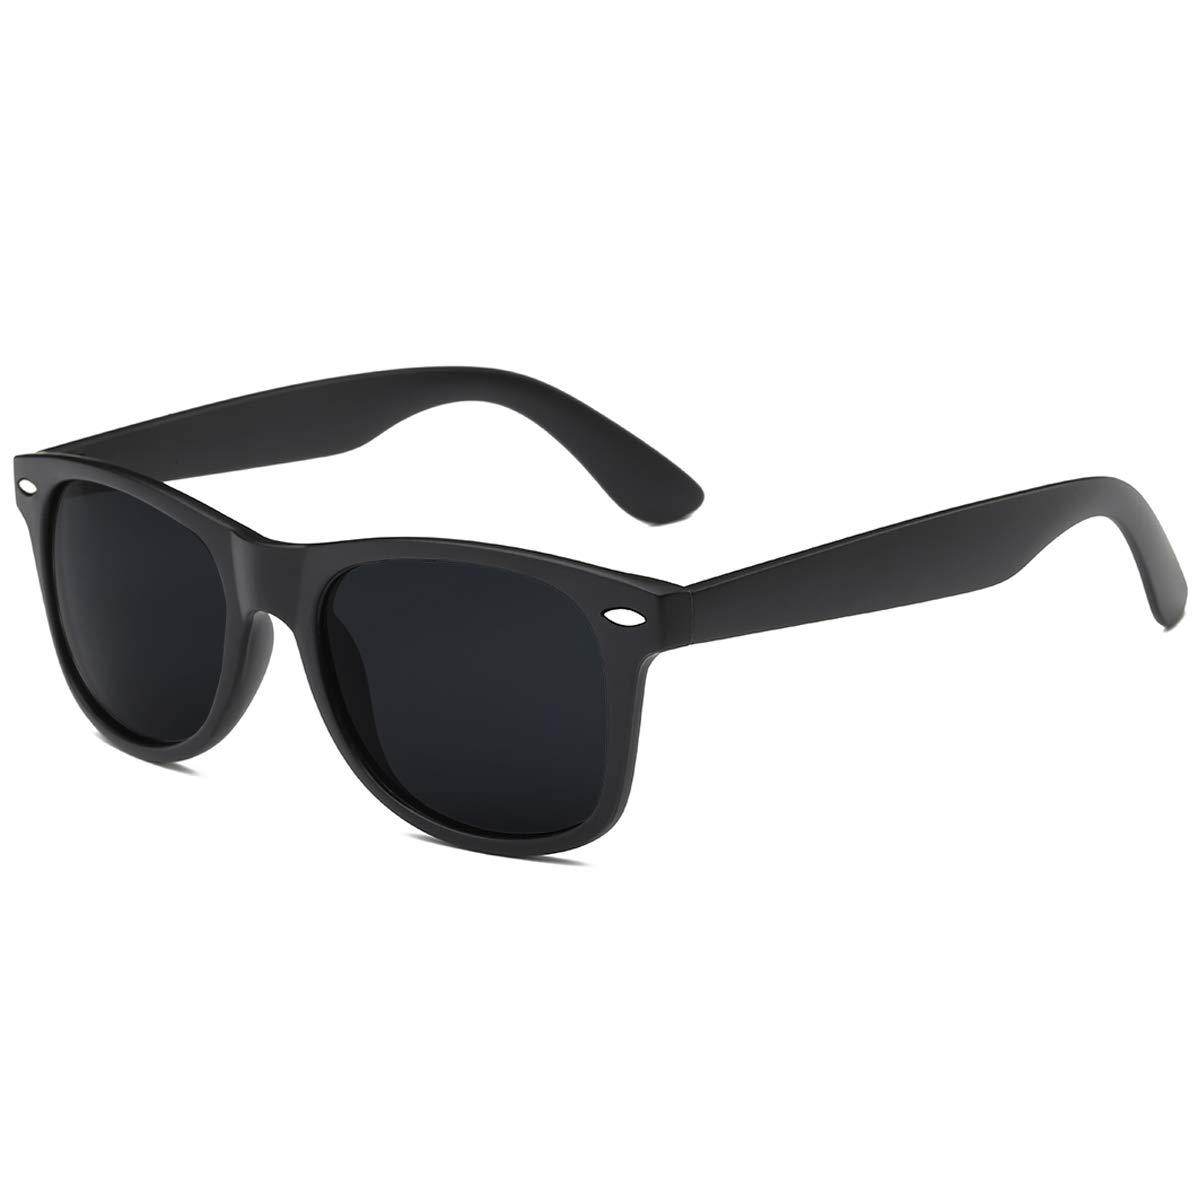 Polarized Sunglasses for Men Retro - FEIDU Polarized Retro Sunglasses for Men FD2149 (black-matte) by FEIDU